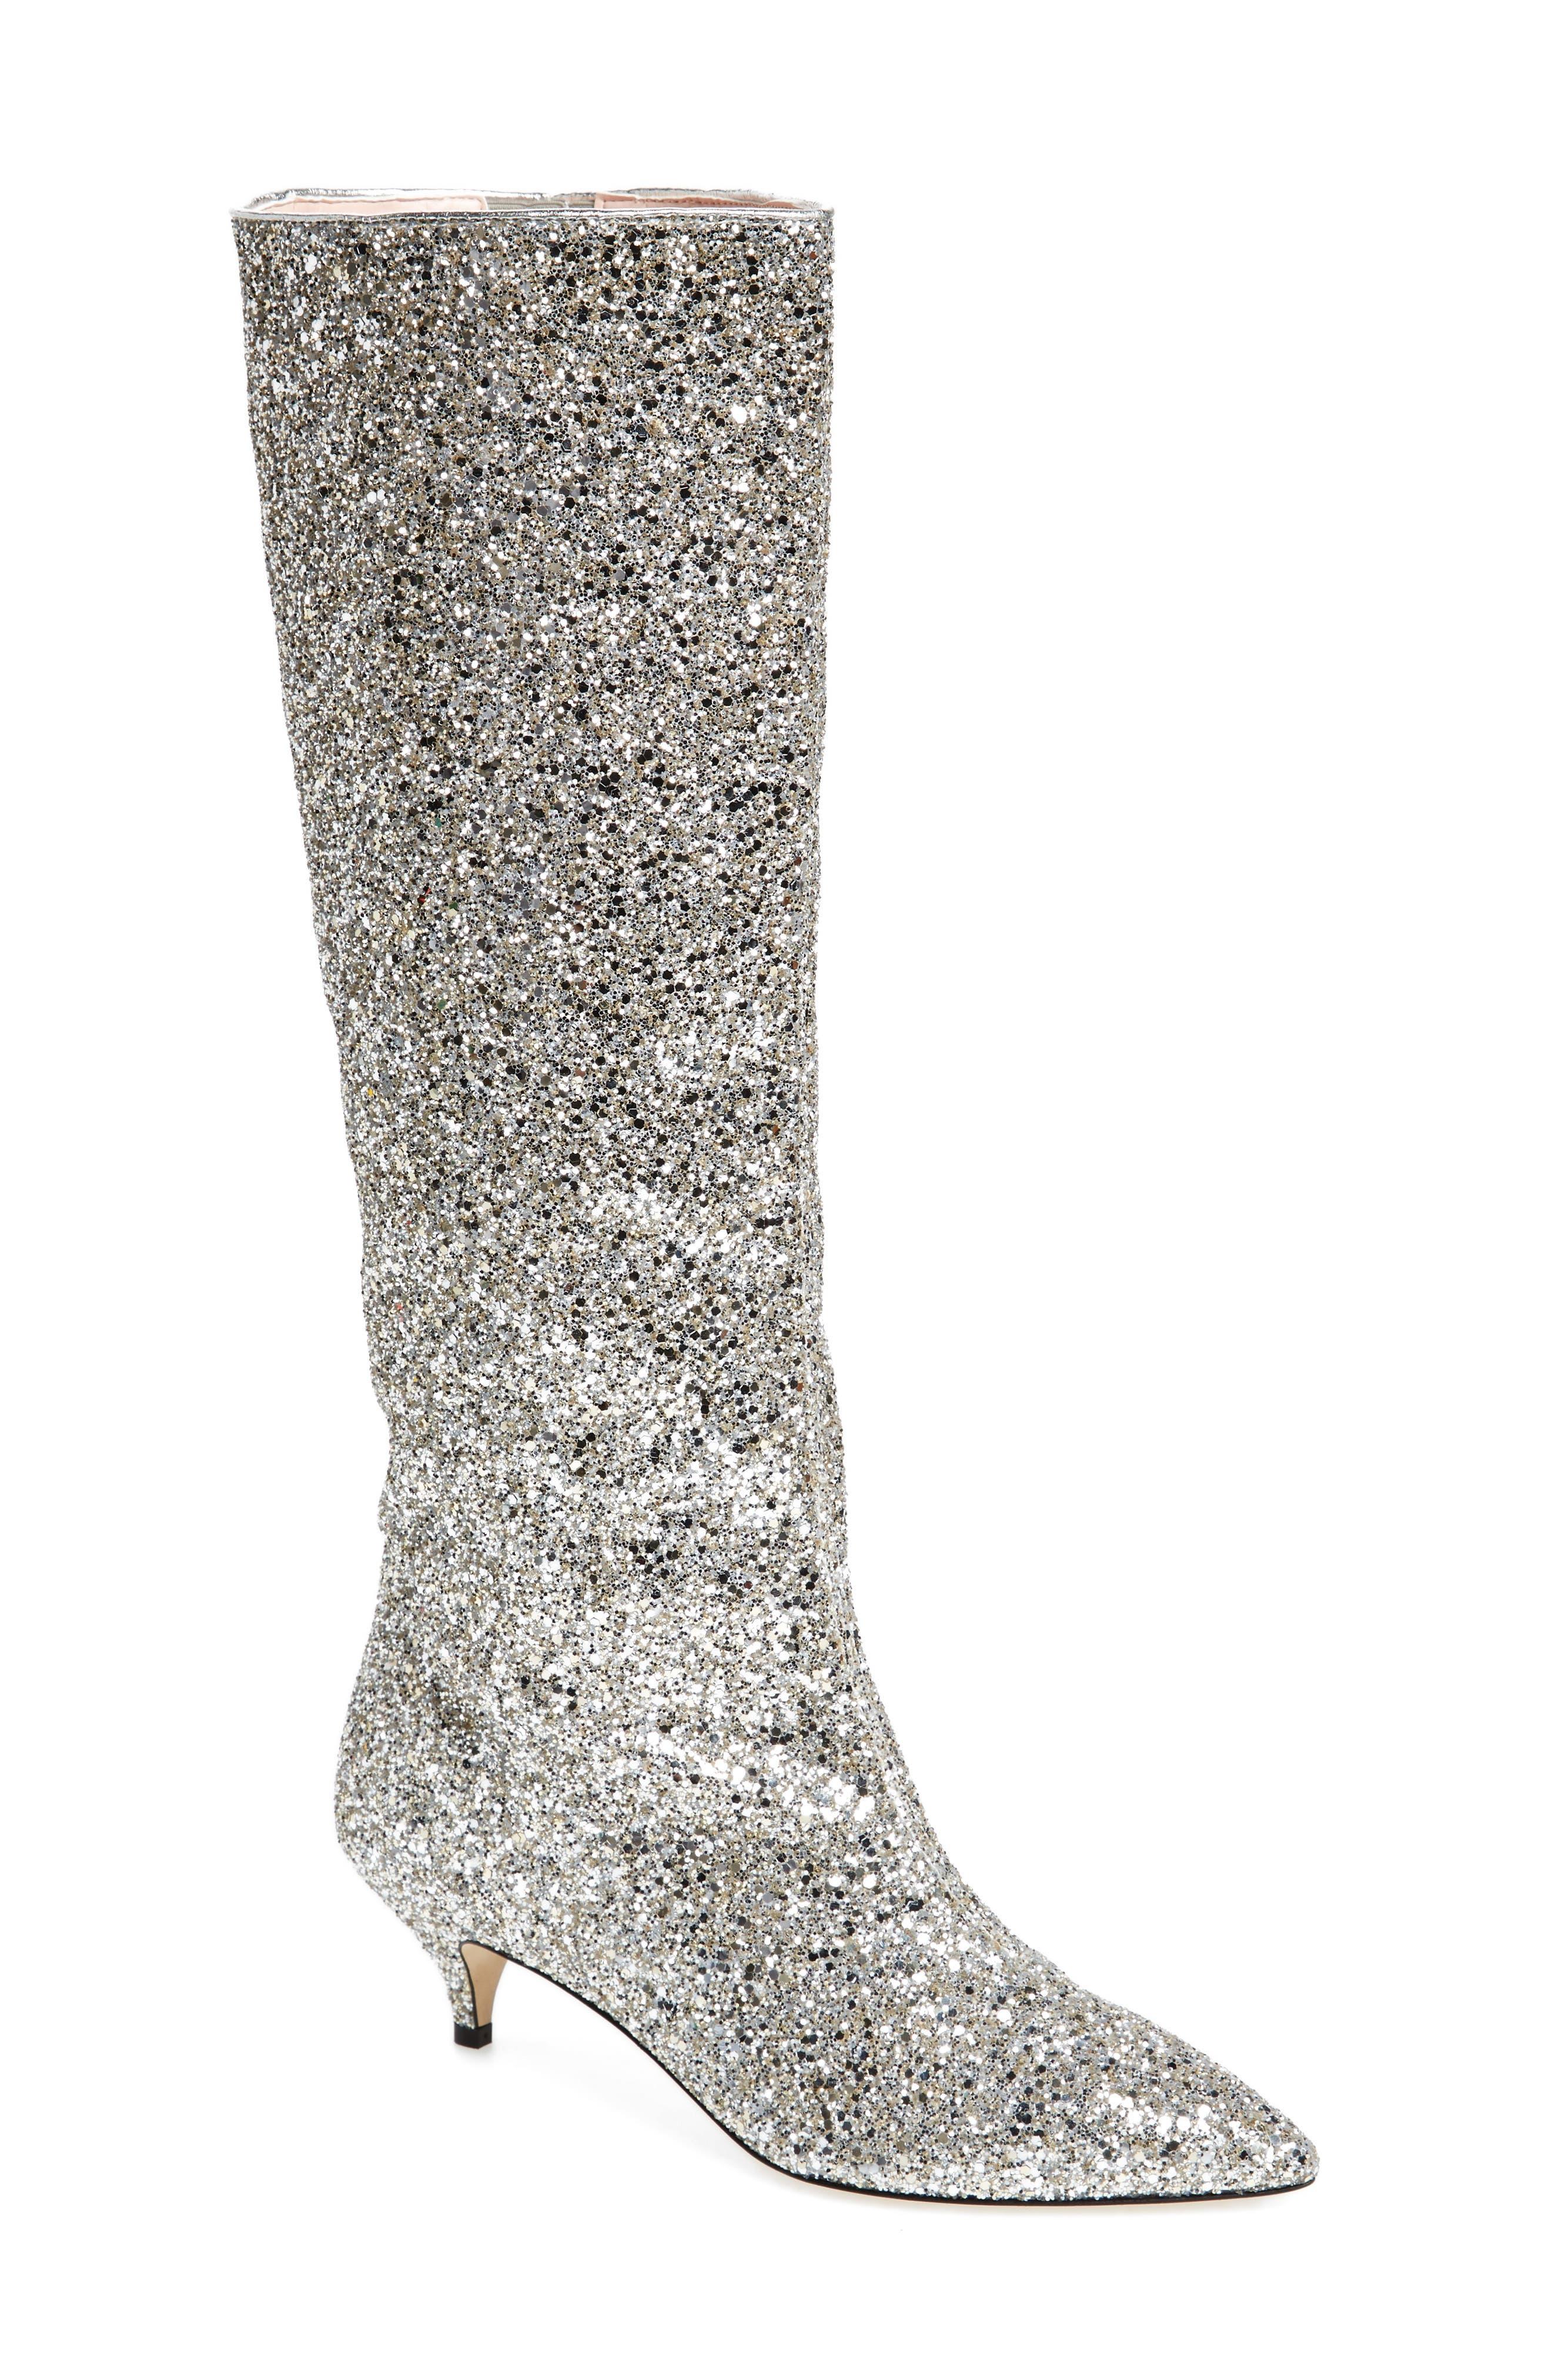 olina glitter knee high boot,                             Main thumbnail 1, color,                             Silver/ Gold Glitter